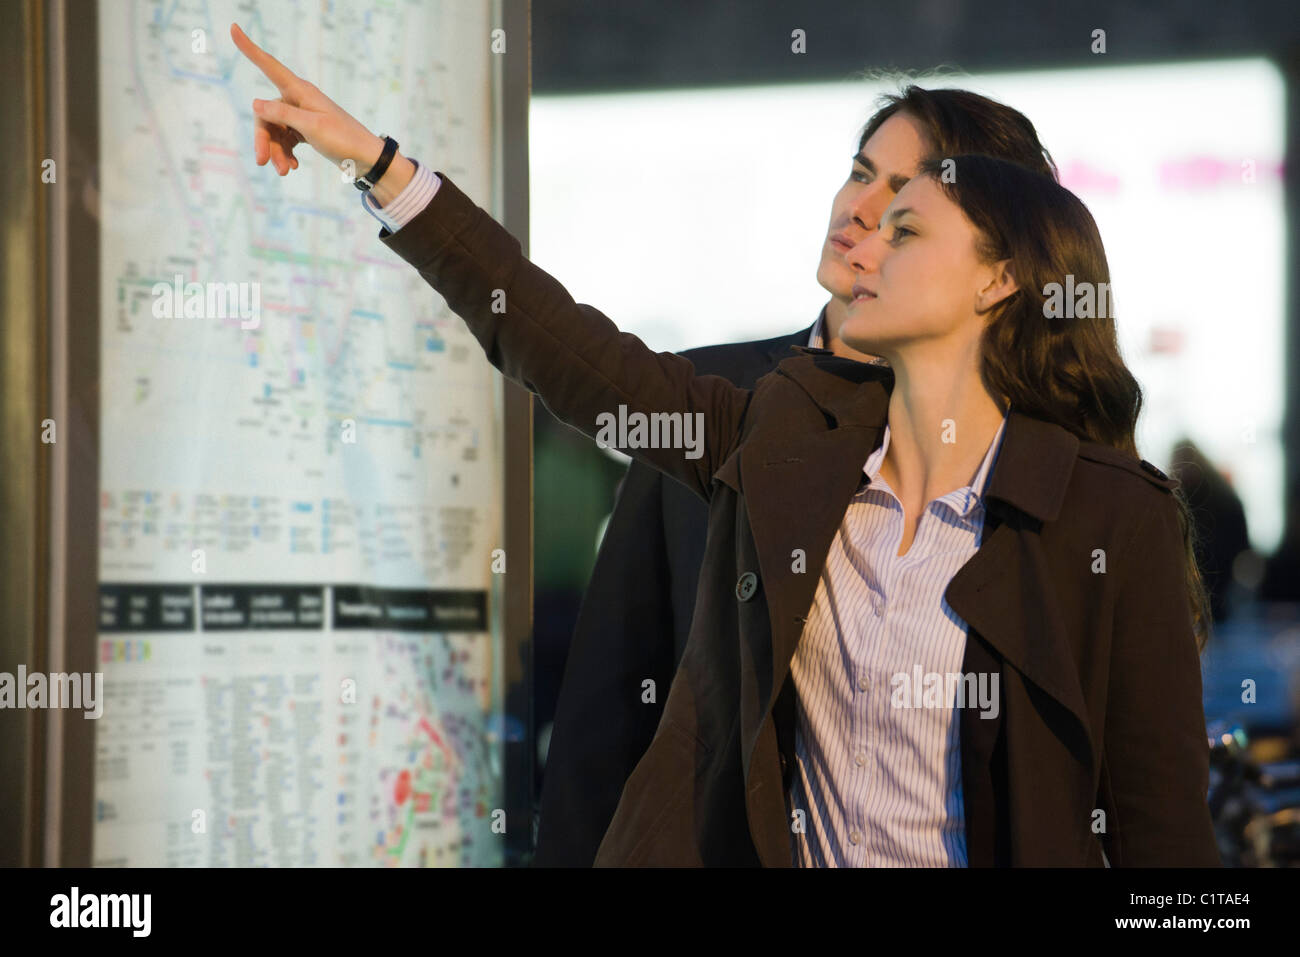 Couple looking at subway map - Stock Image